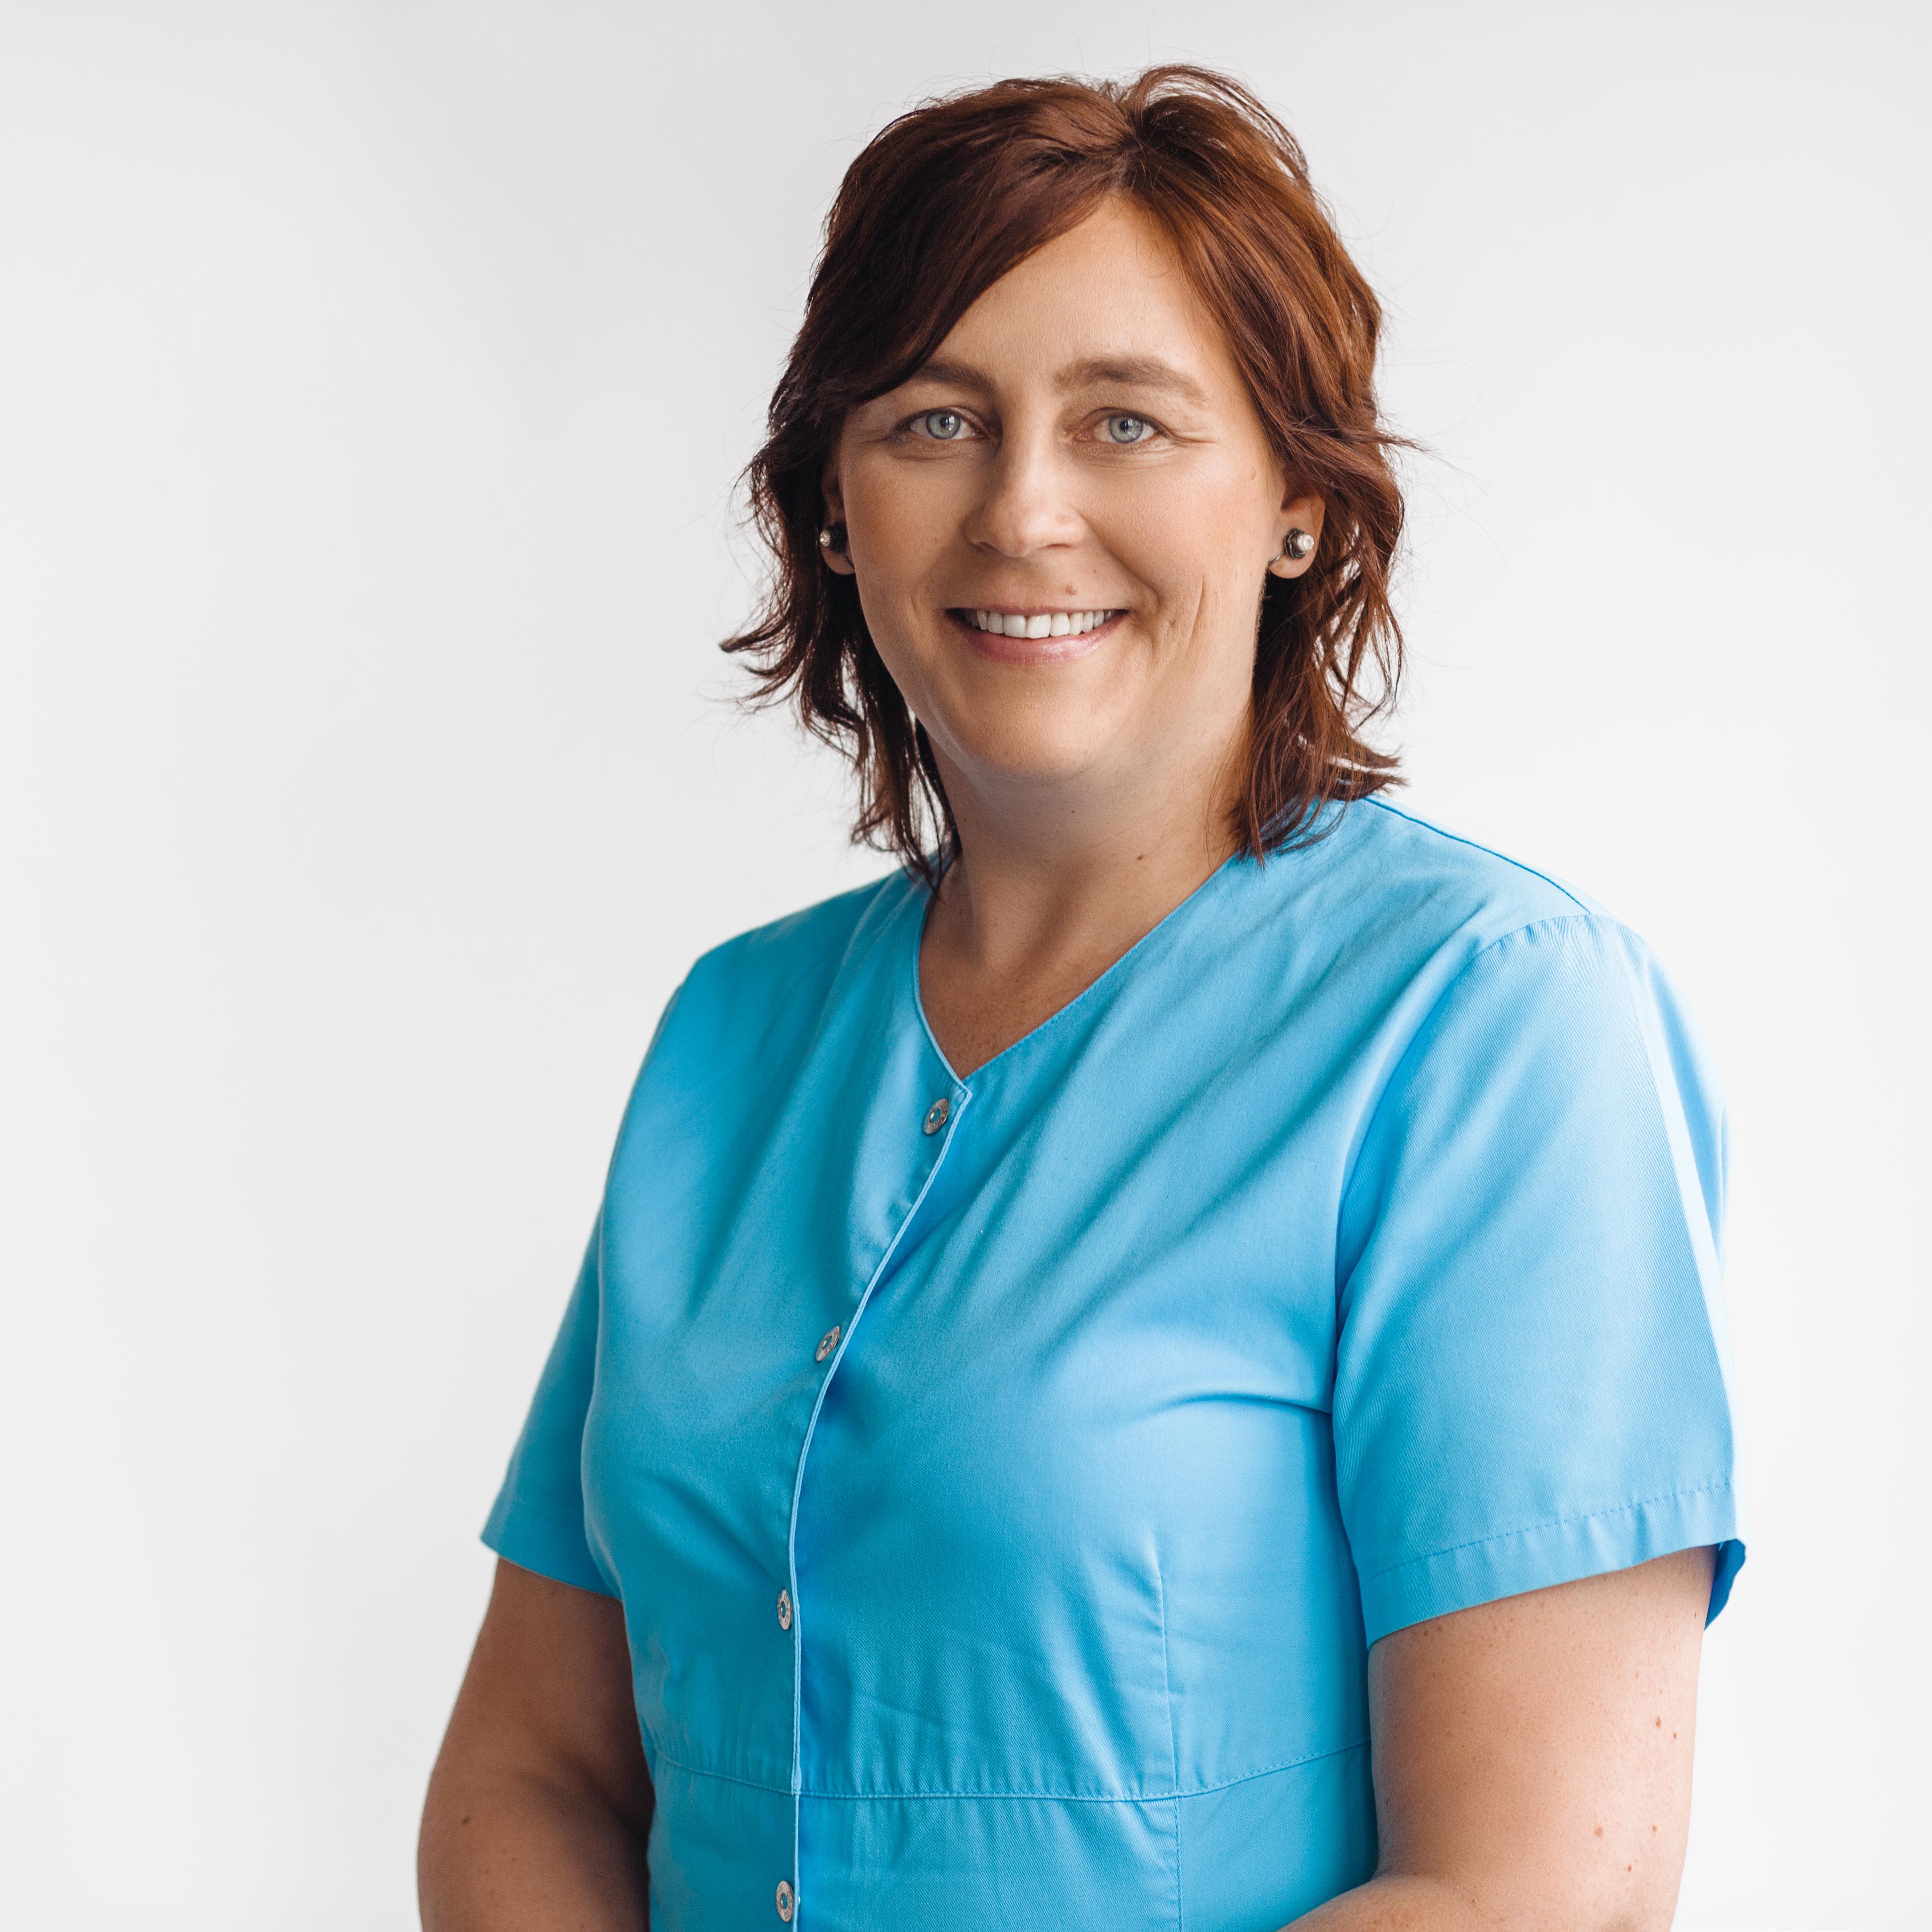 Dr Maarja Avameri